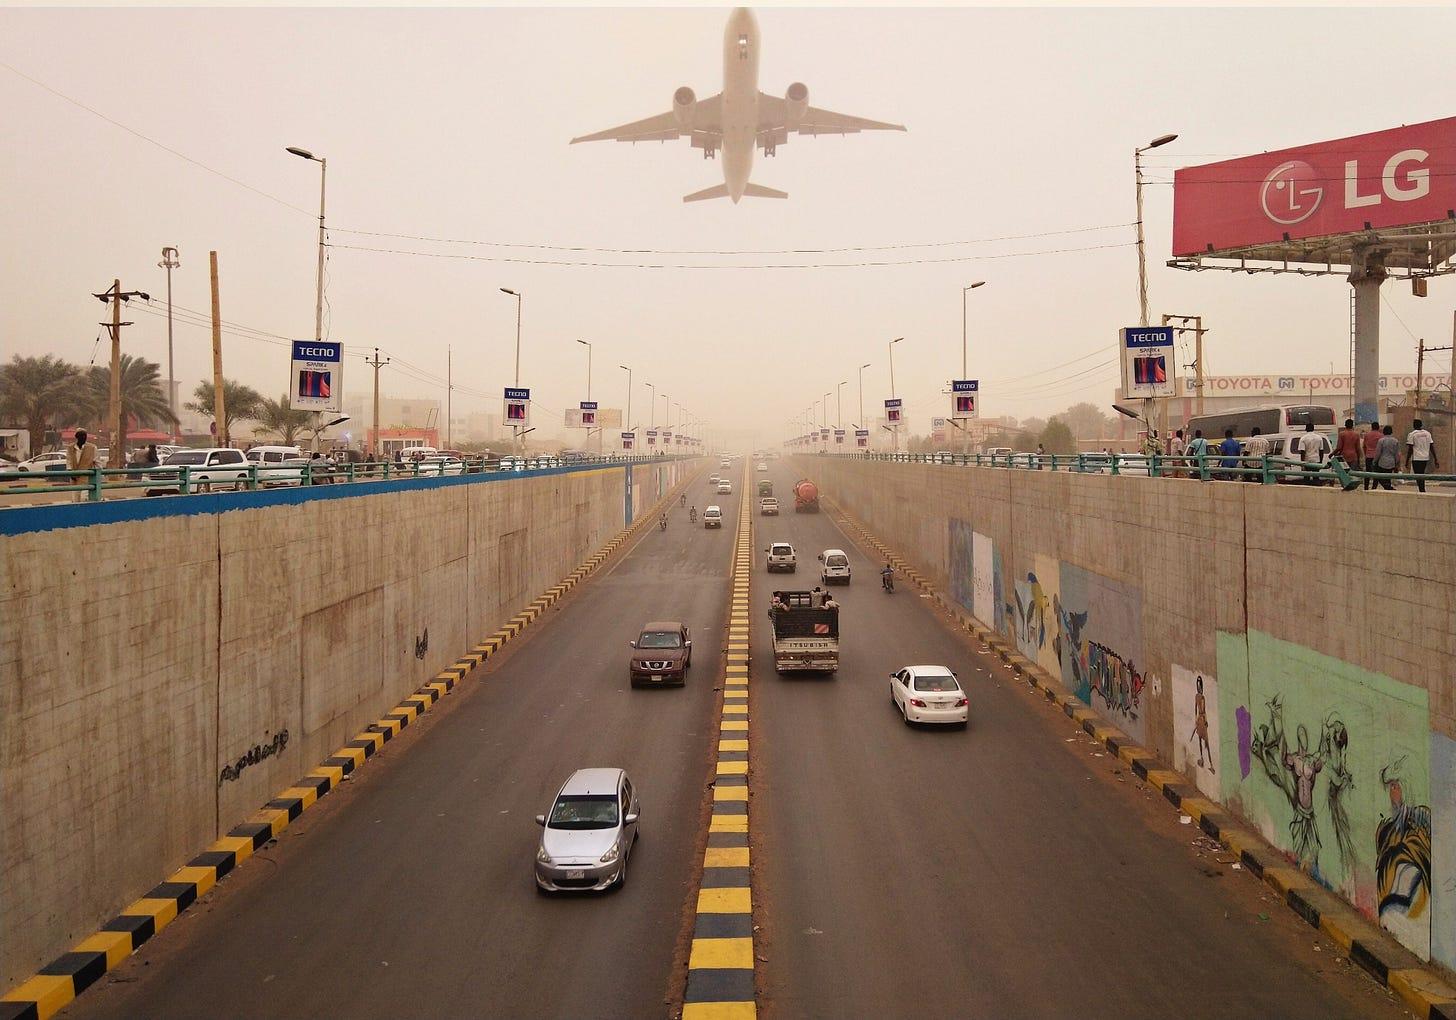 File:Khartoum, Africa road tunnel.jpg - Wikimedia Commons